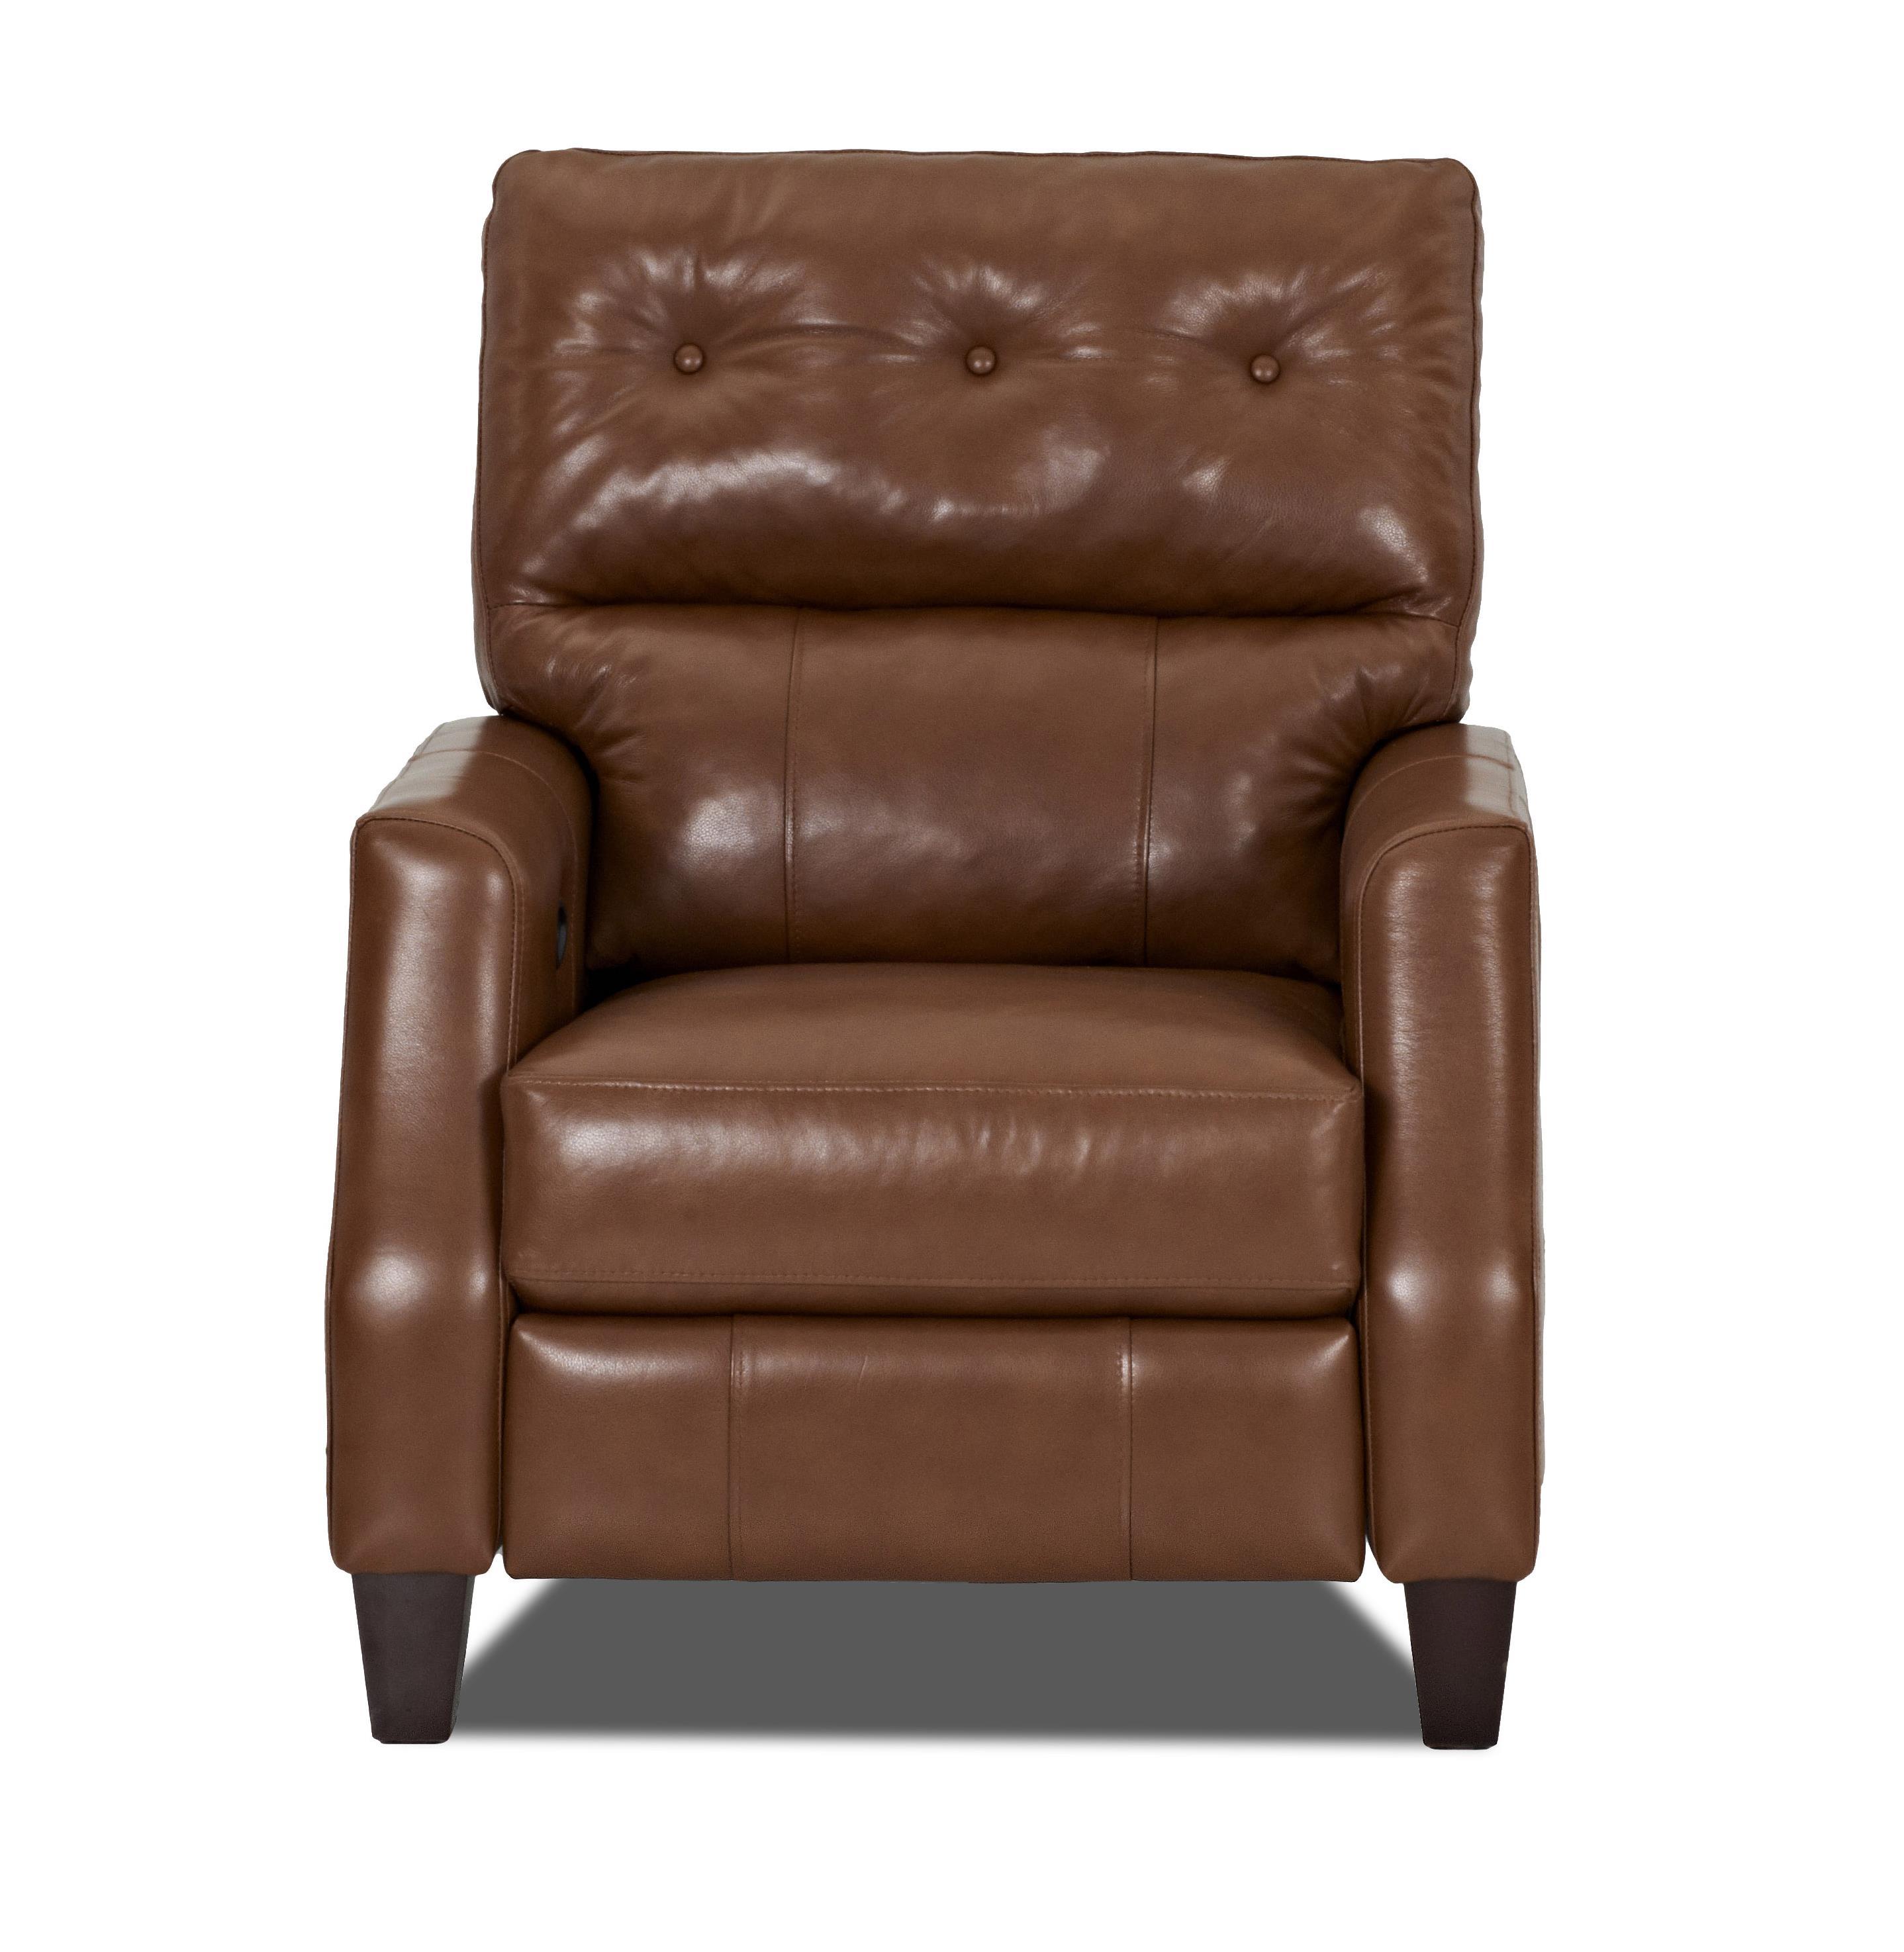 Klaussner Amesbury  Power High Leg Reclining Chair - Item Number: LT51708 PHLRC-DurangoAcorn